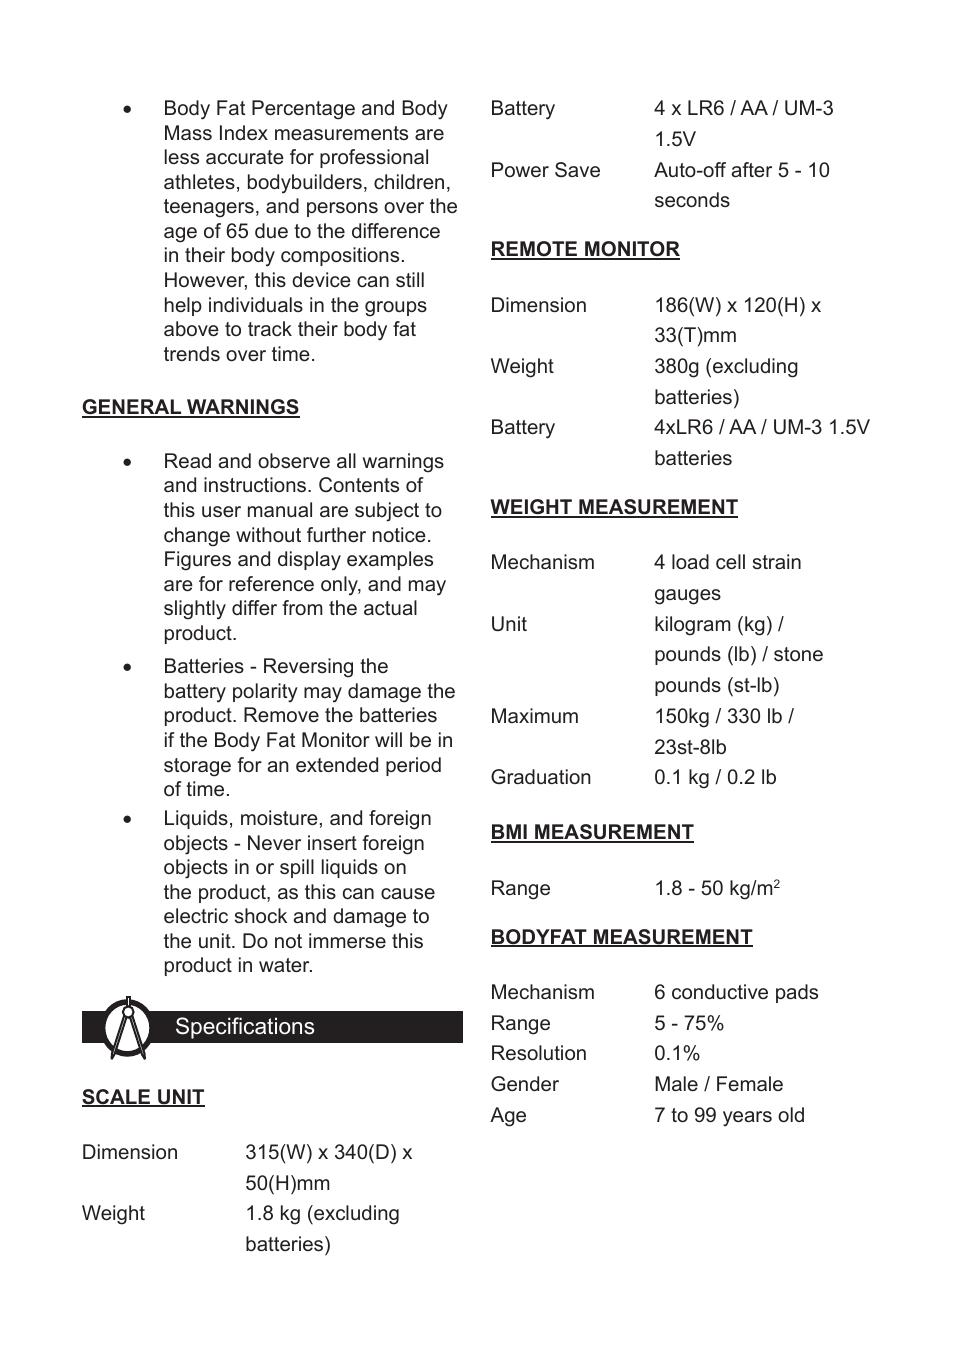 Oregon Scientific Body Fat Monitor With Wireless Remote Display GR101 User Manual